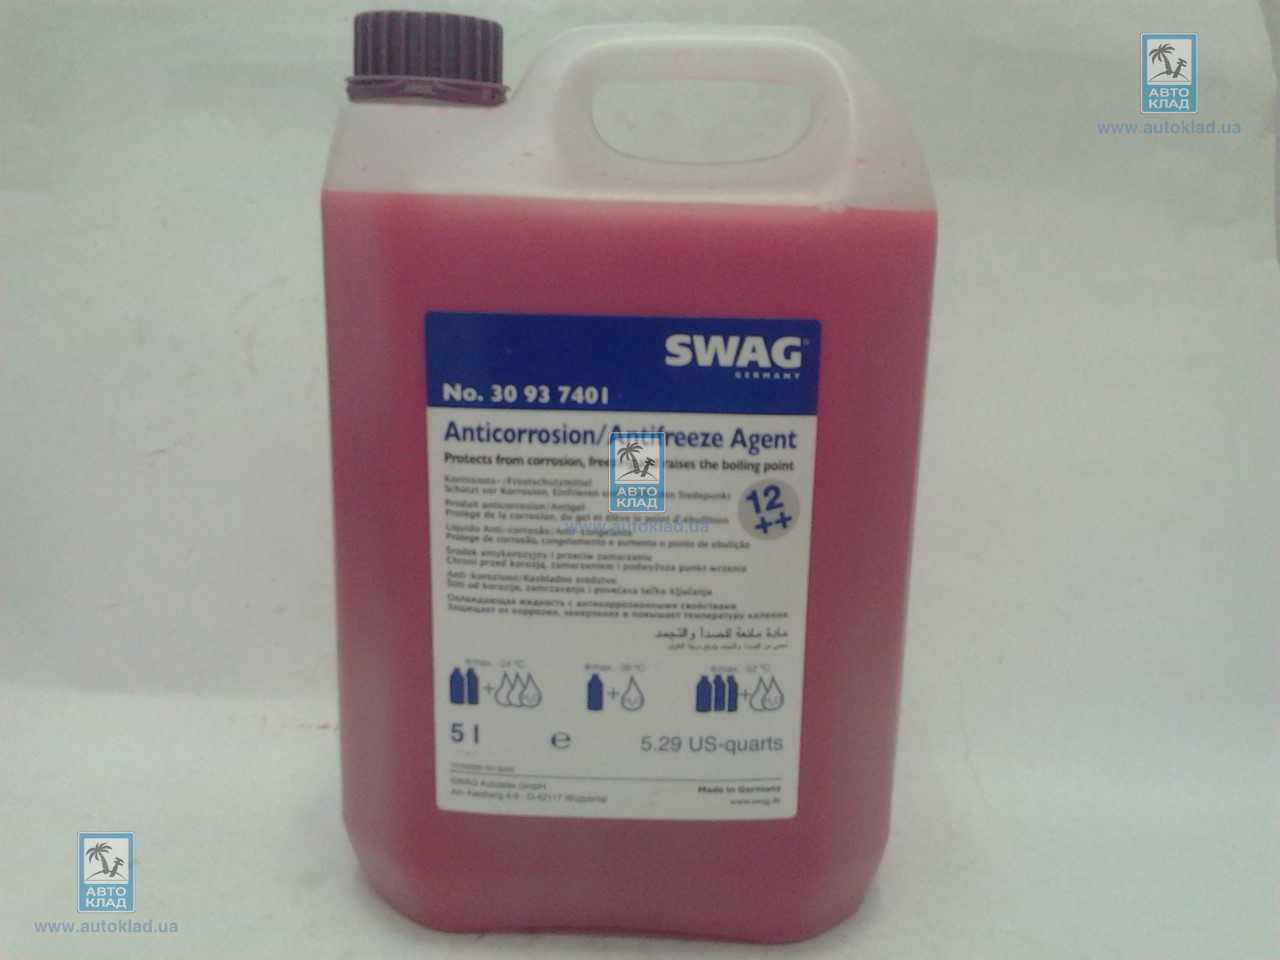 Антифриз G12++ 5л SWAG 30 93 7401